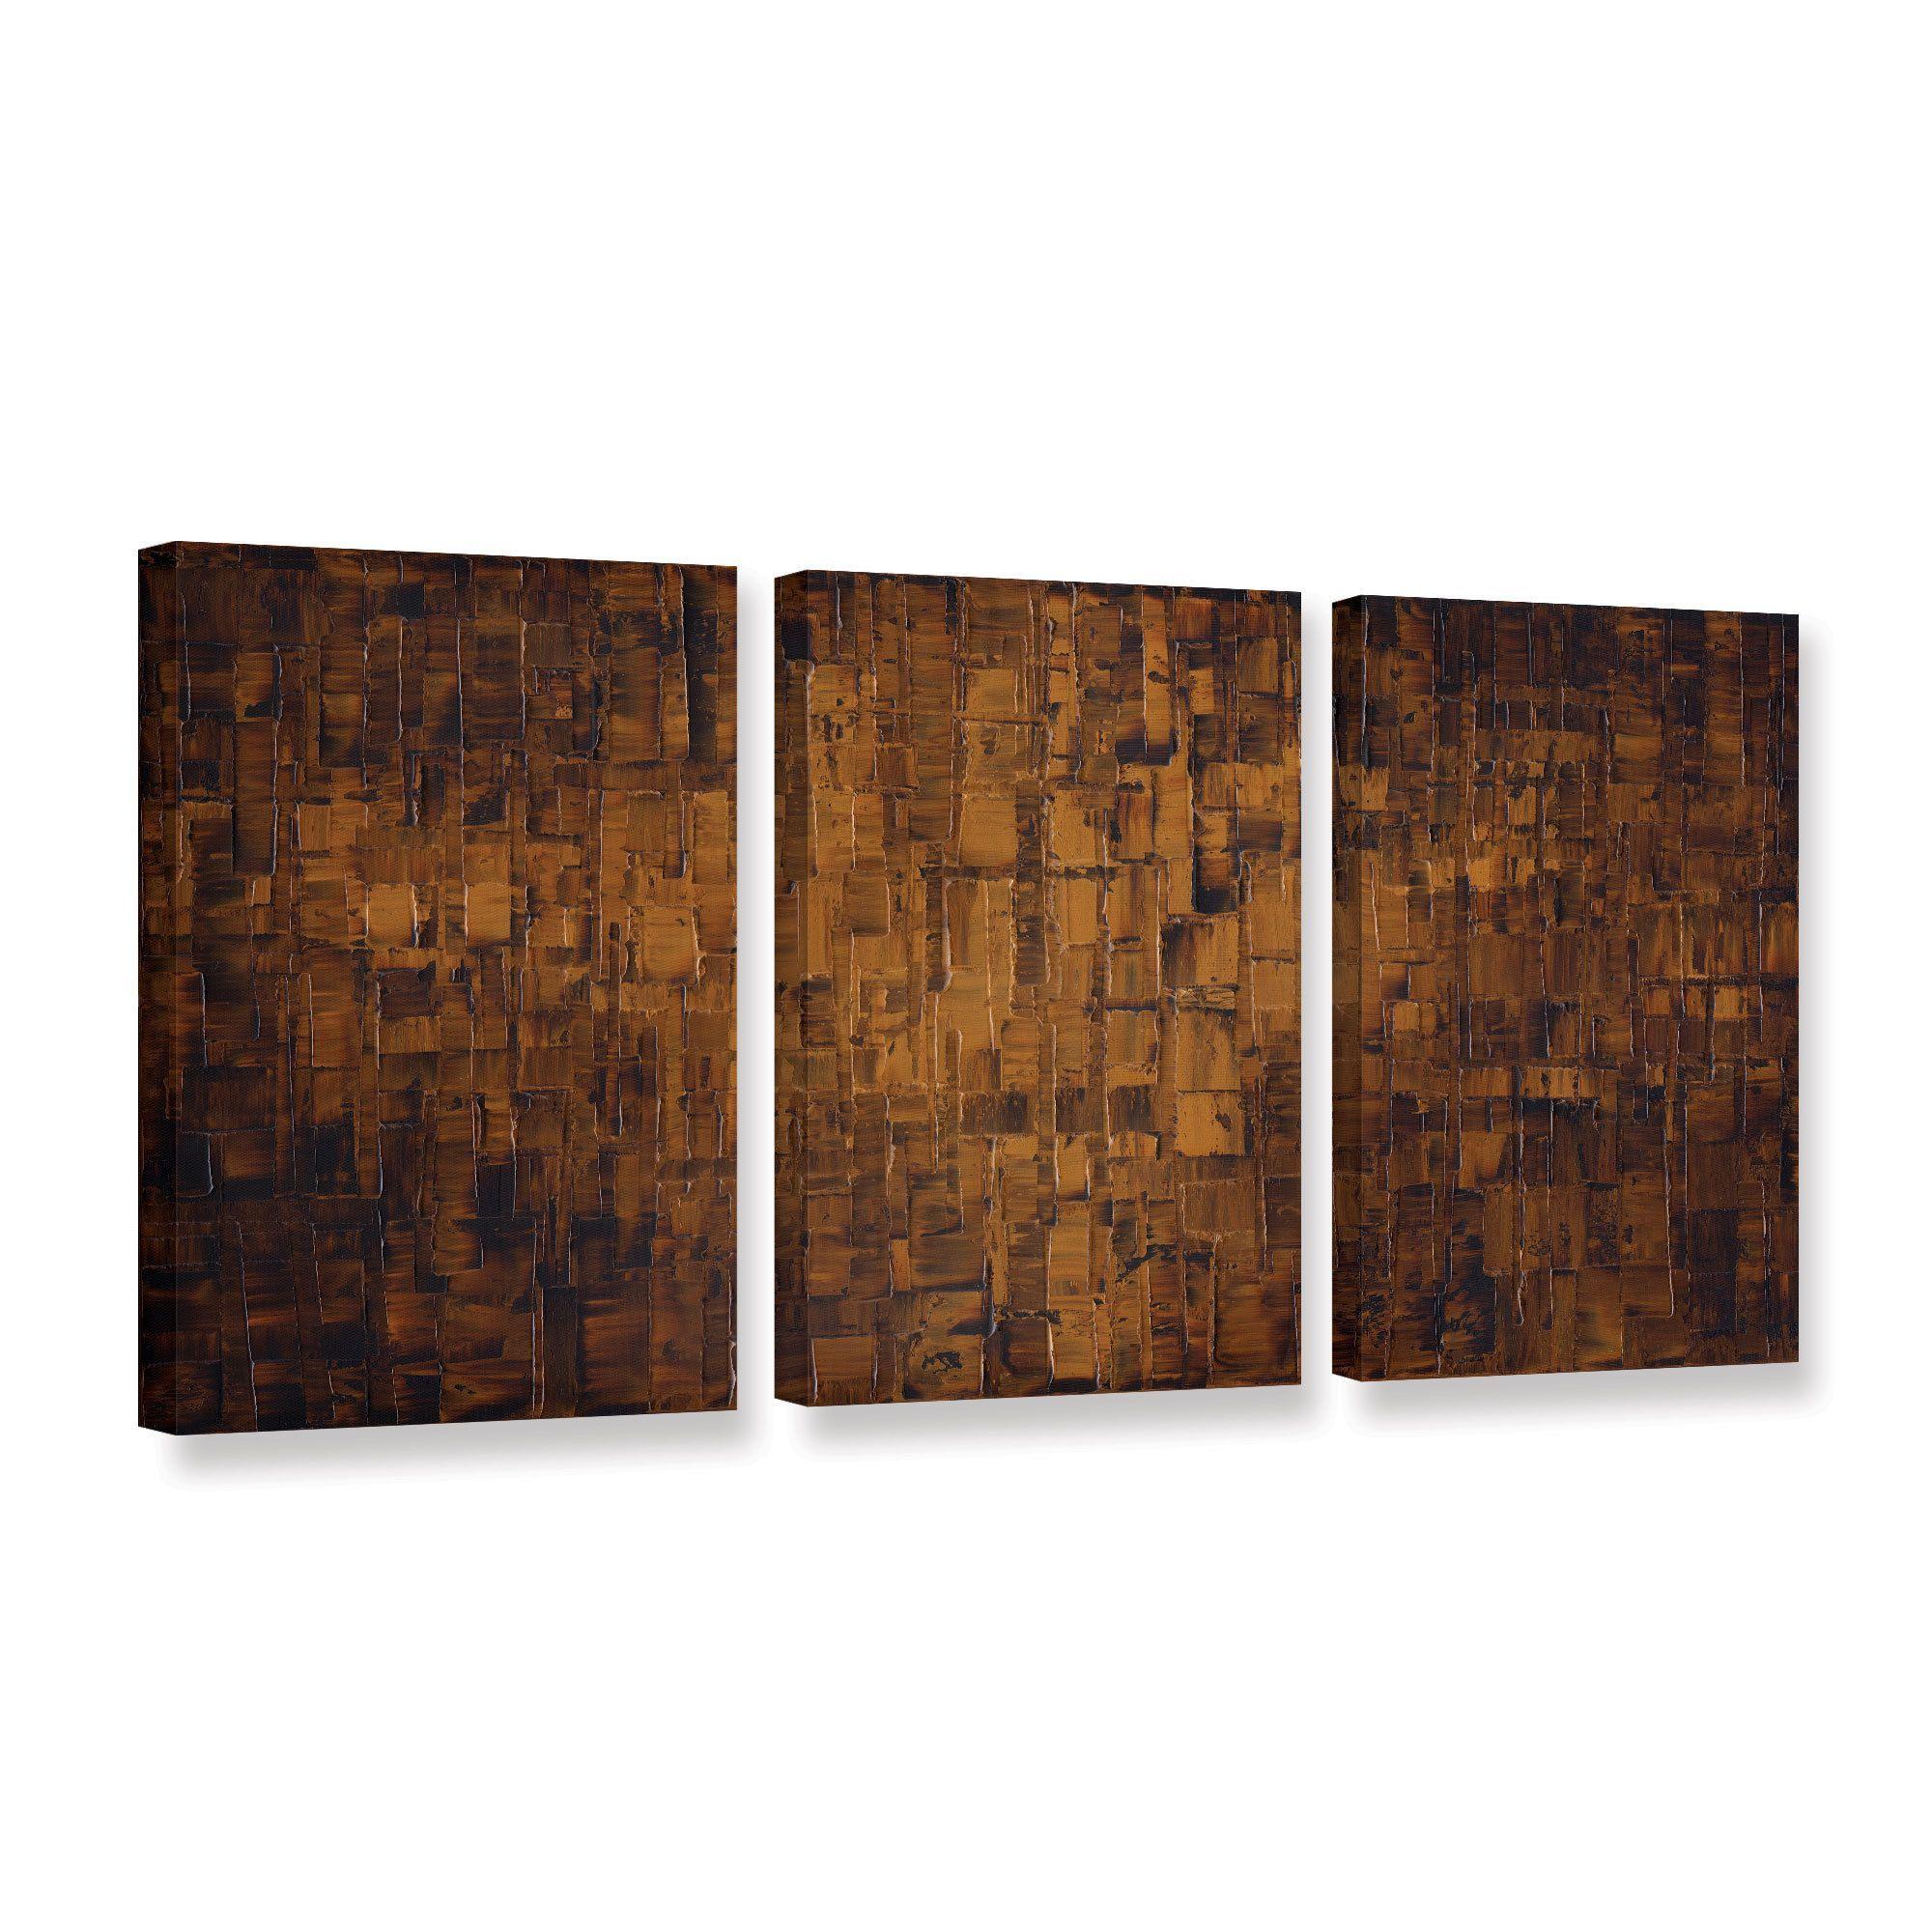 Artwall susanna shaposhnikovaus brown piece gallery wrapped